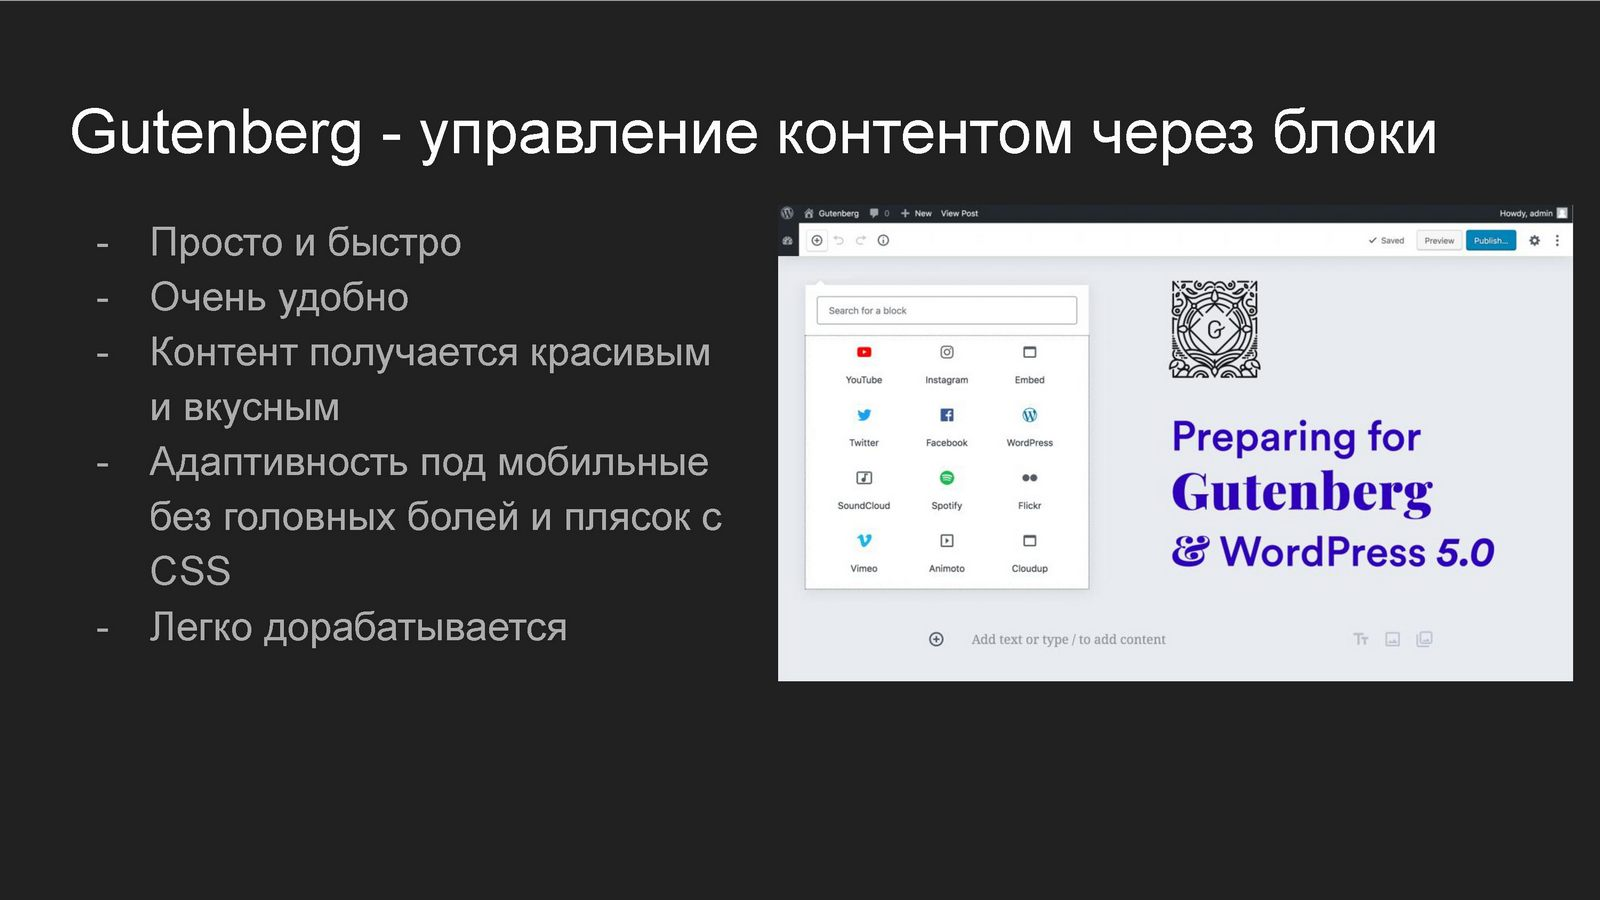 wp10-Анатолий Юмашев-Агрегатор bizzapps.ru 06